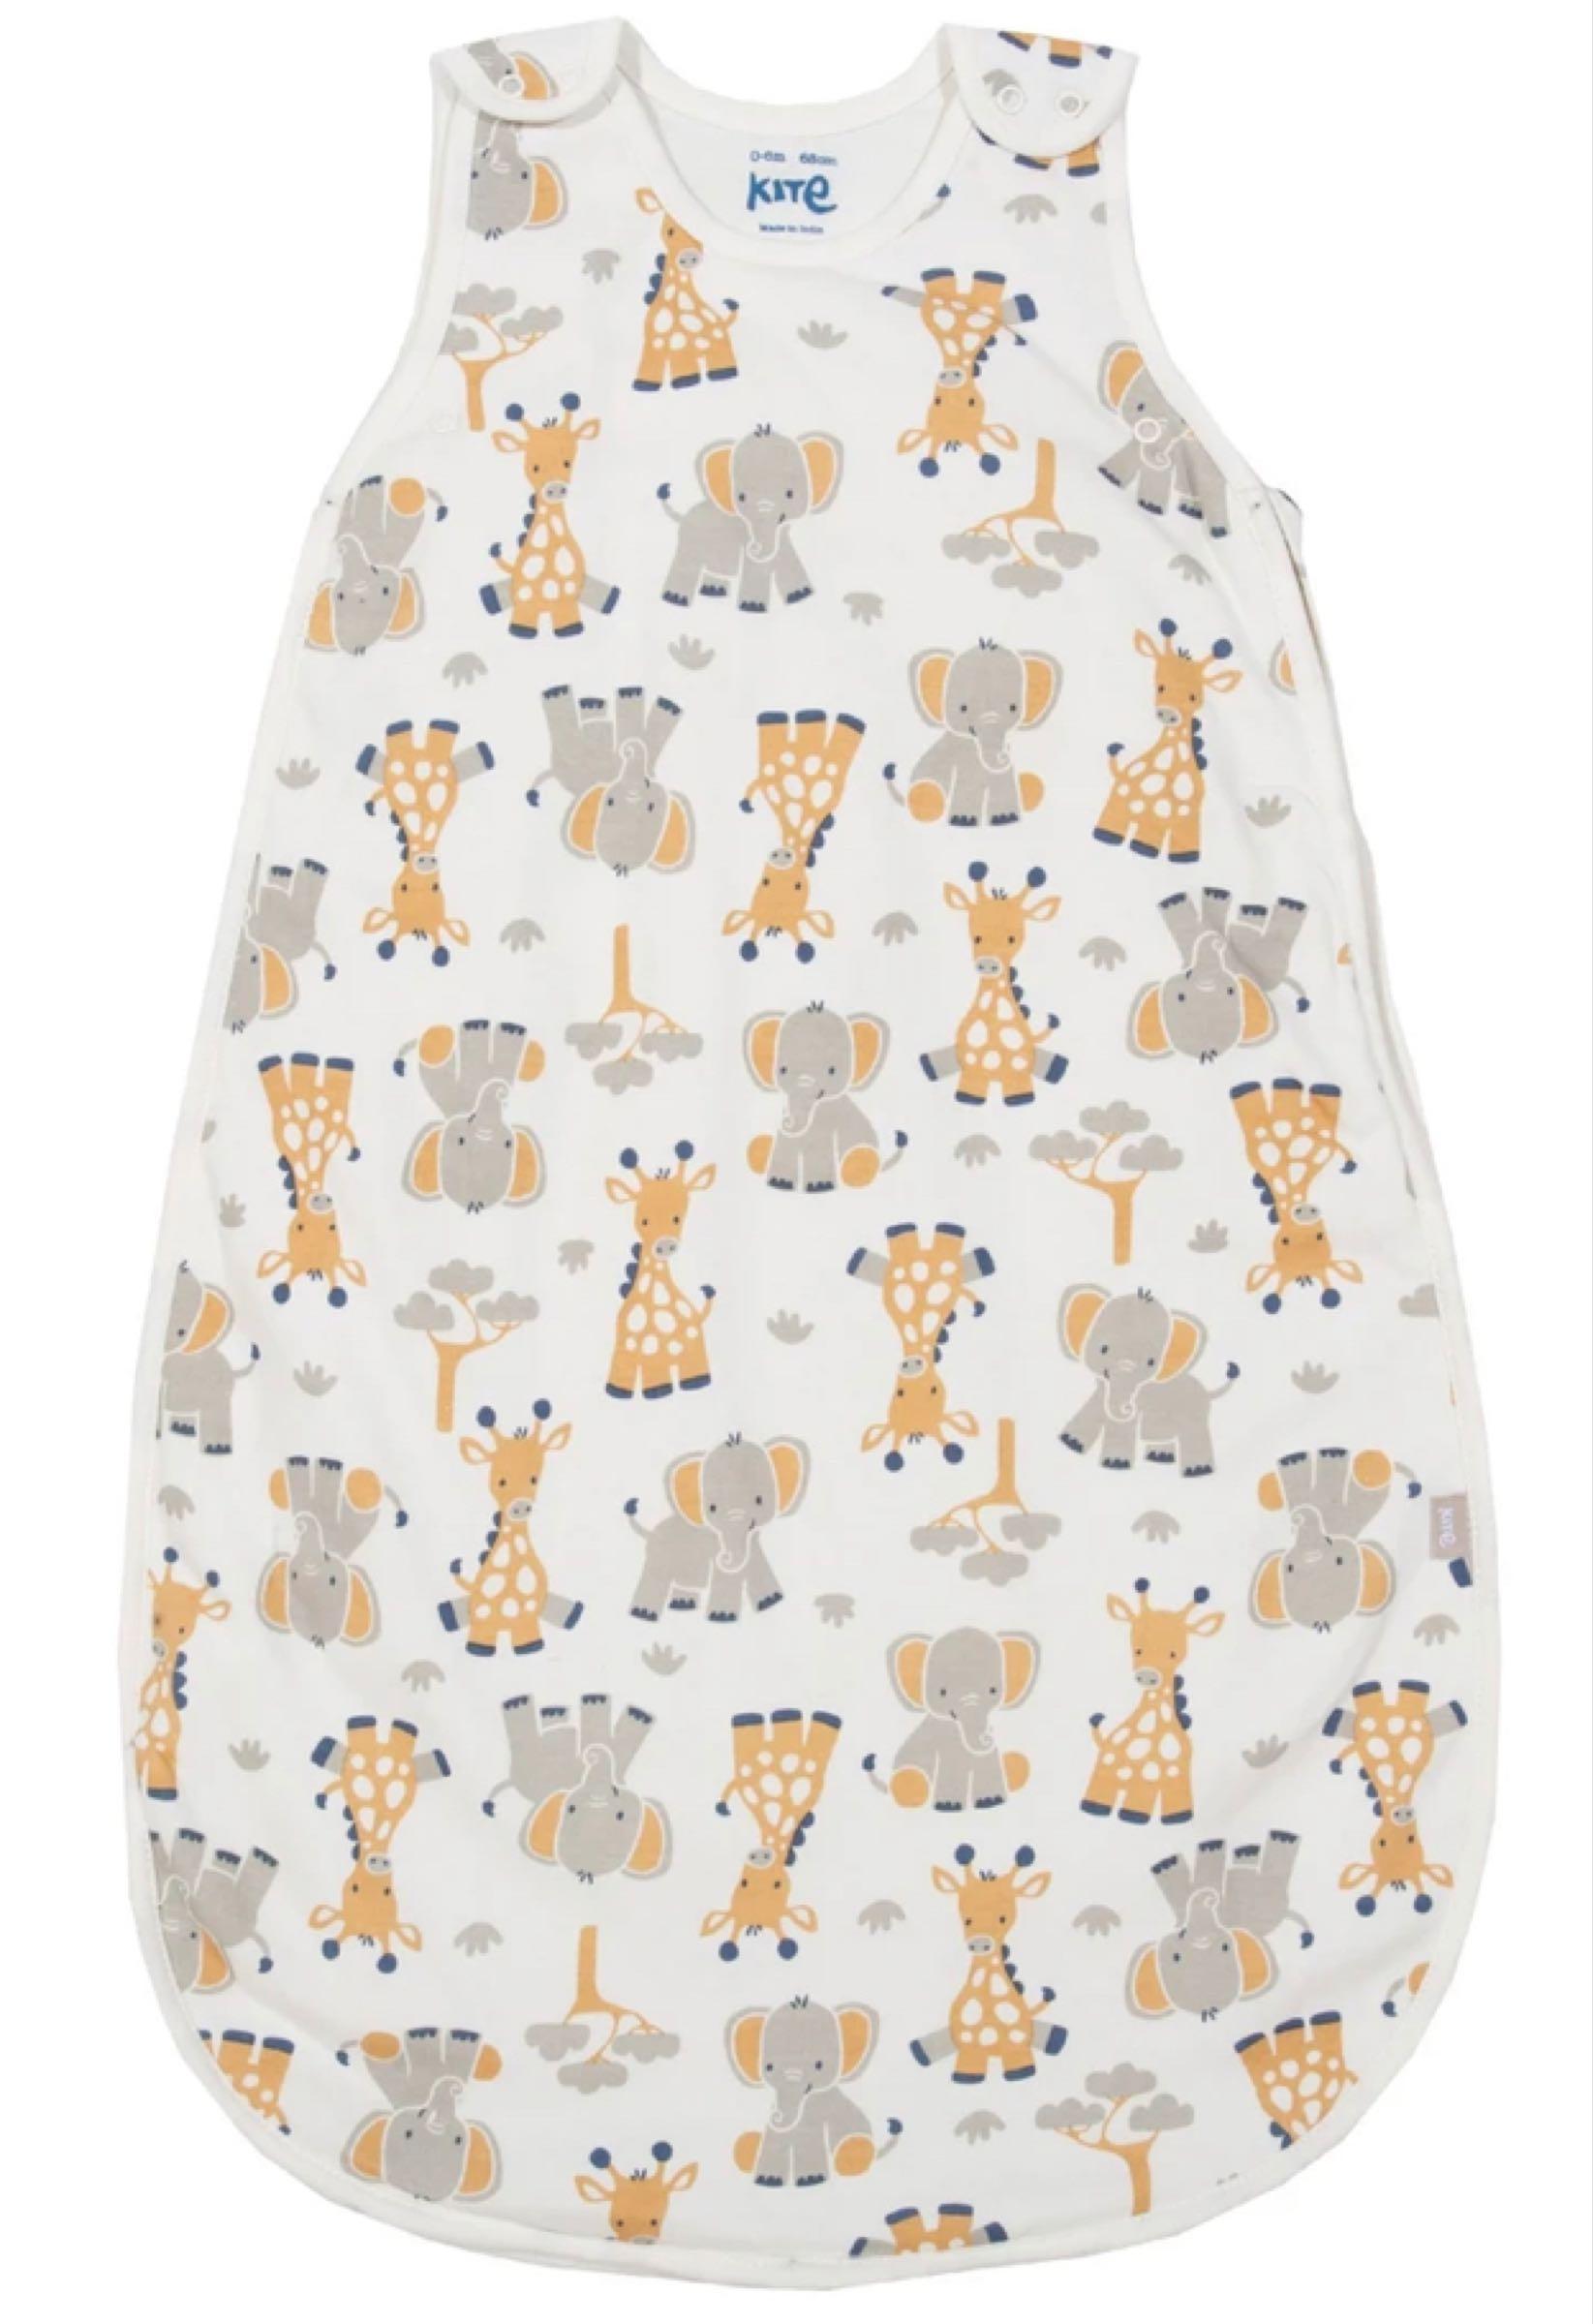 Giraffe and elephant sleep bag